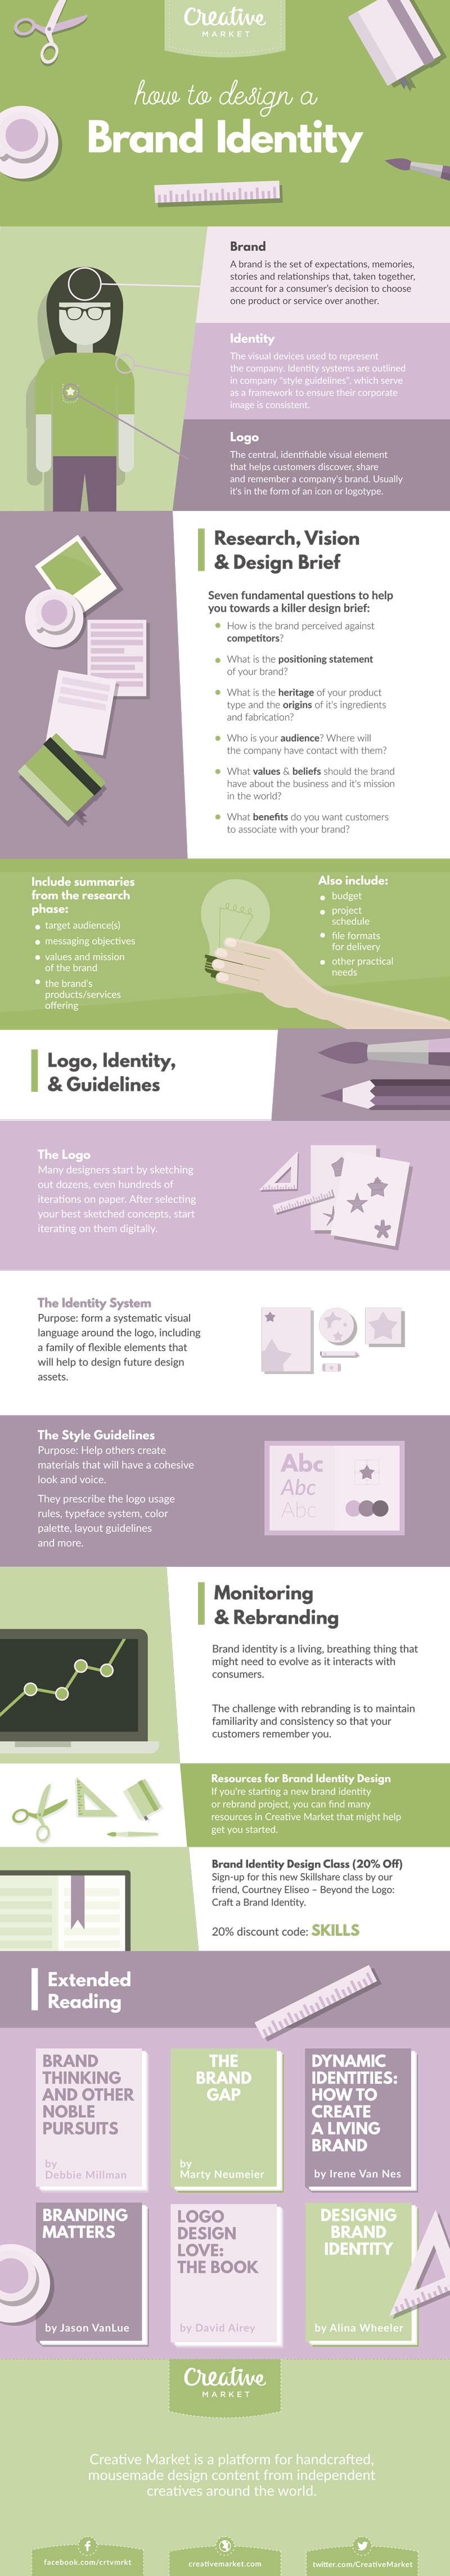 how to design a brand identity visual recap creative market blog